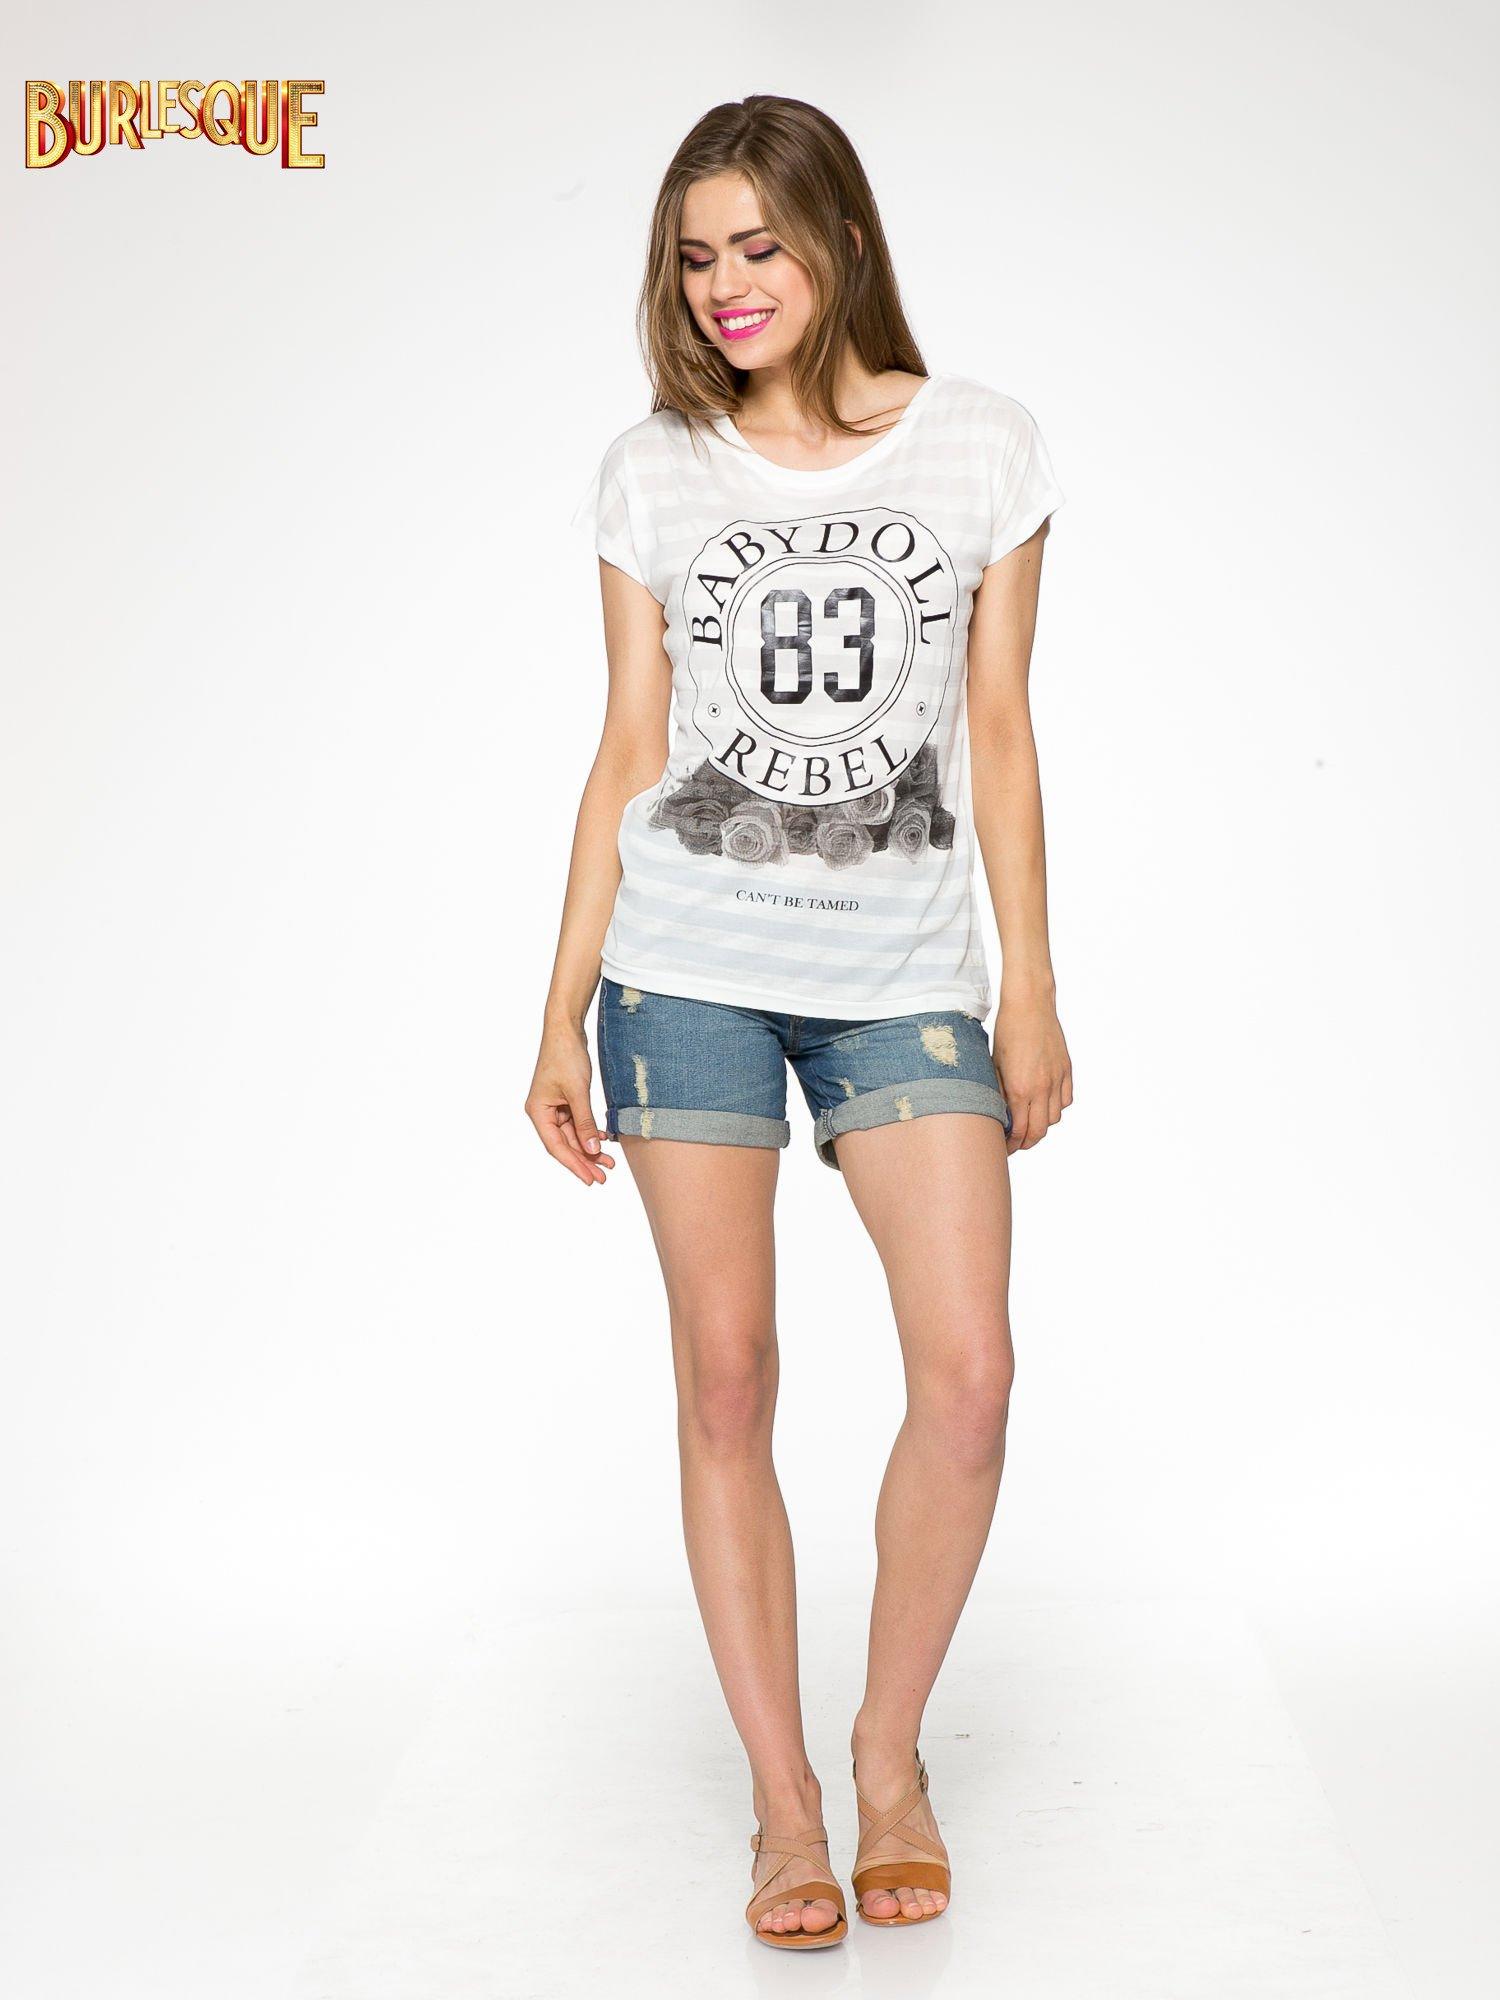 Ecru t-shirt z nadrukiem BABYDOLL REBEL 83                                  zdj.                                  2